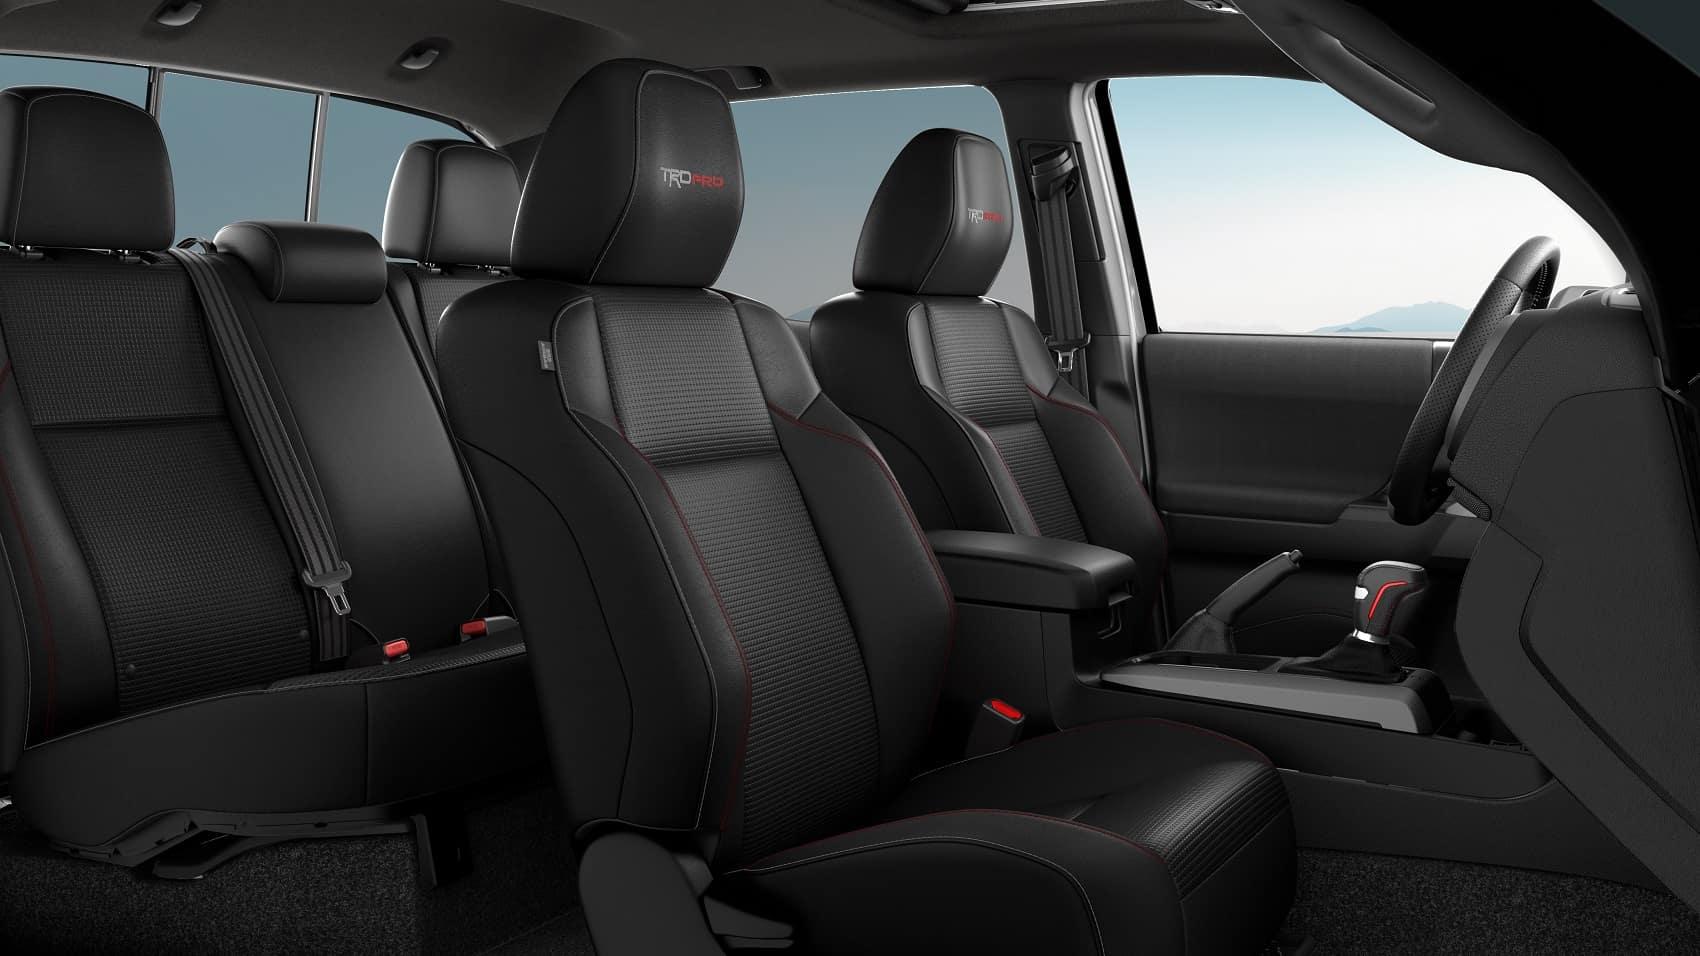 2020 Toyota Tacoma Interior Dimensions